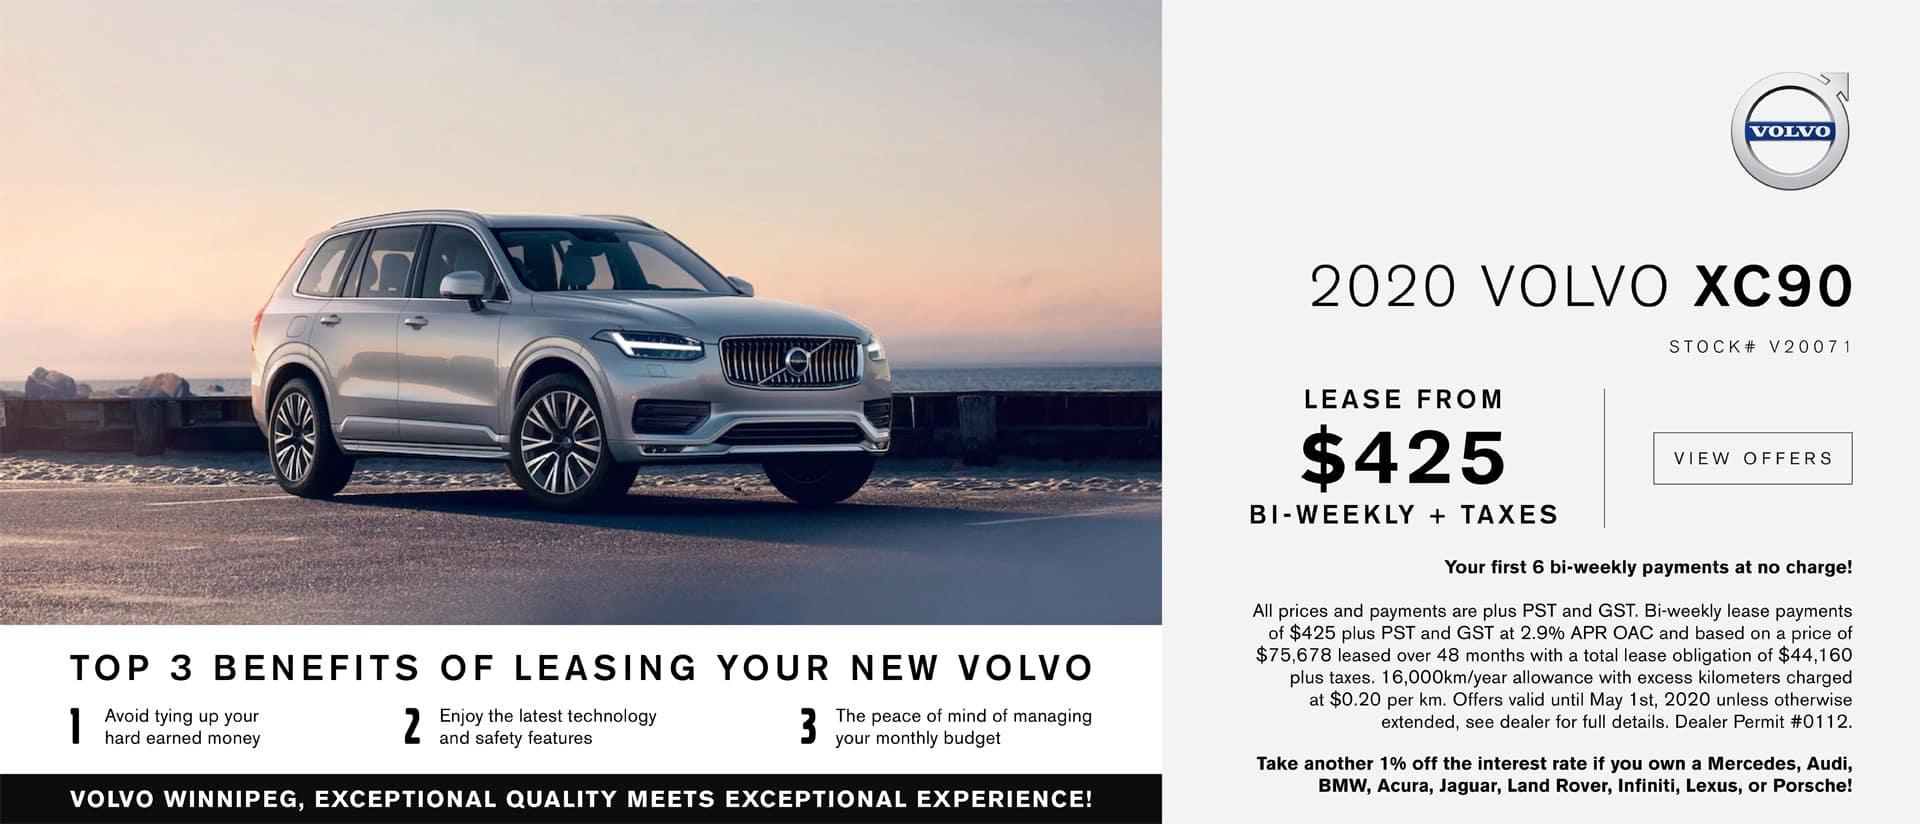 Volvo Winnipeg April XC90 Lease Offer